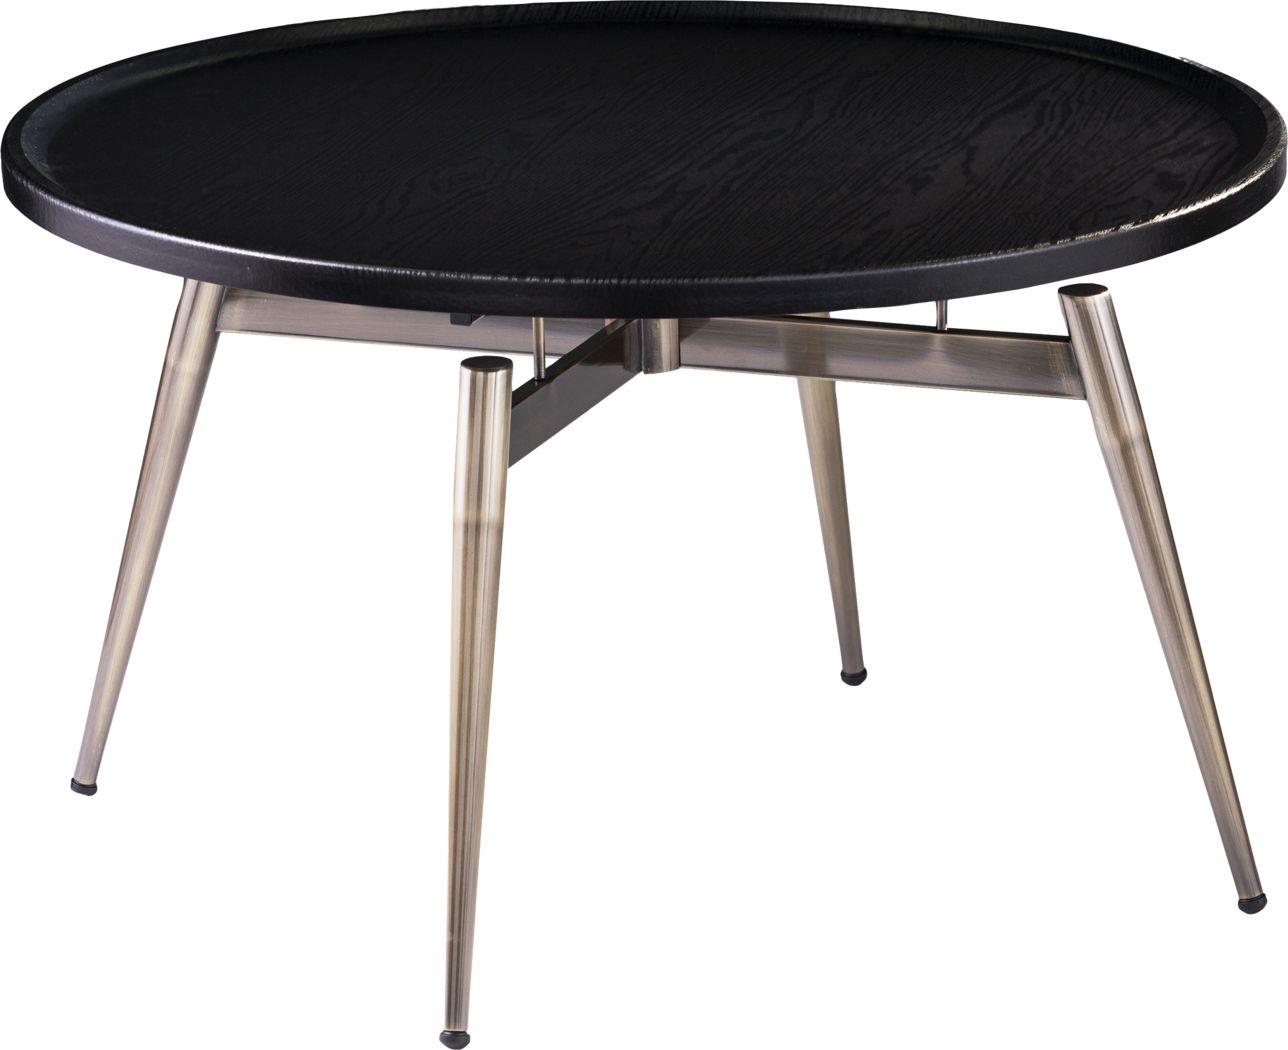 Lockmere Black Cocktail Table